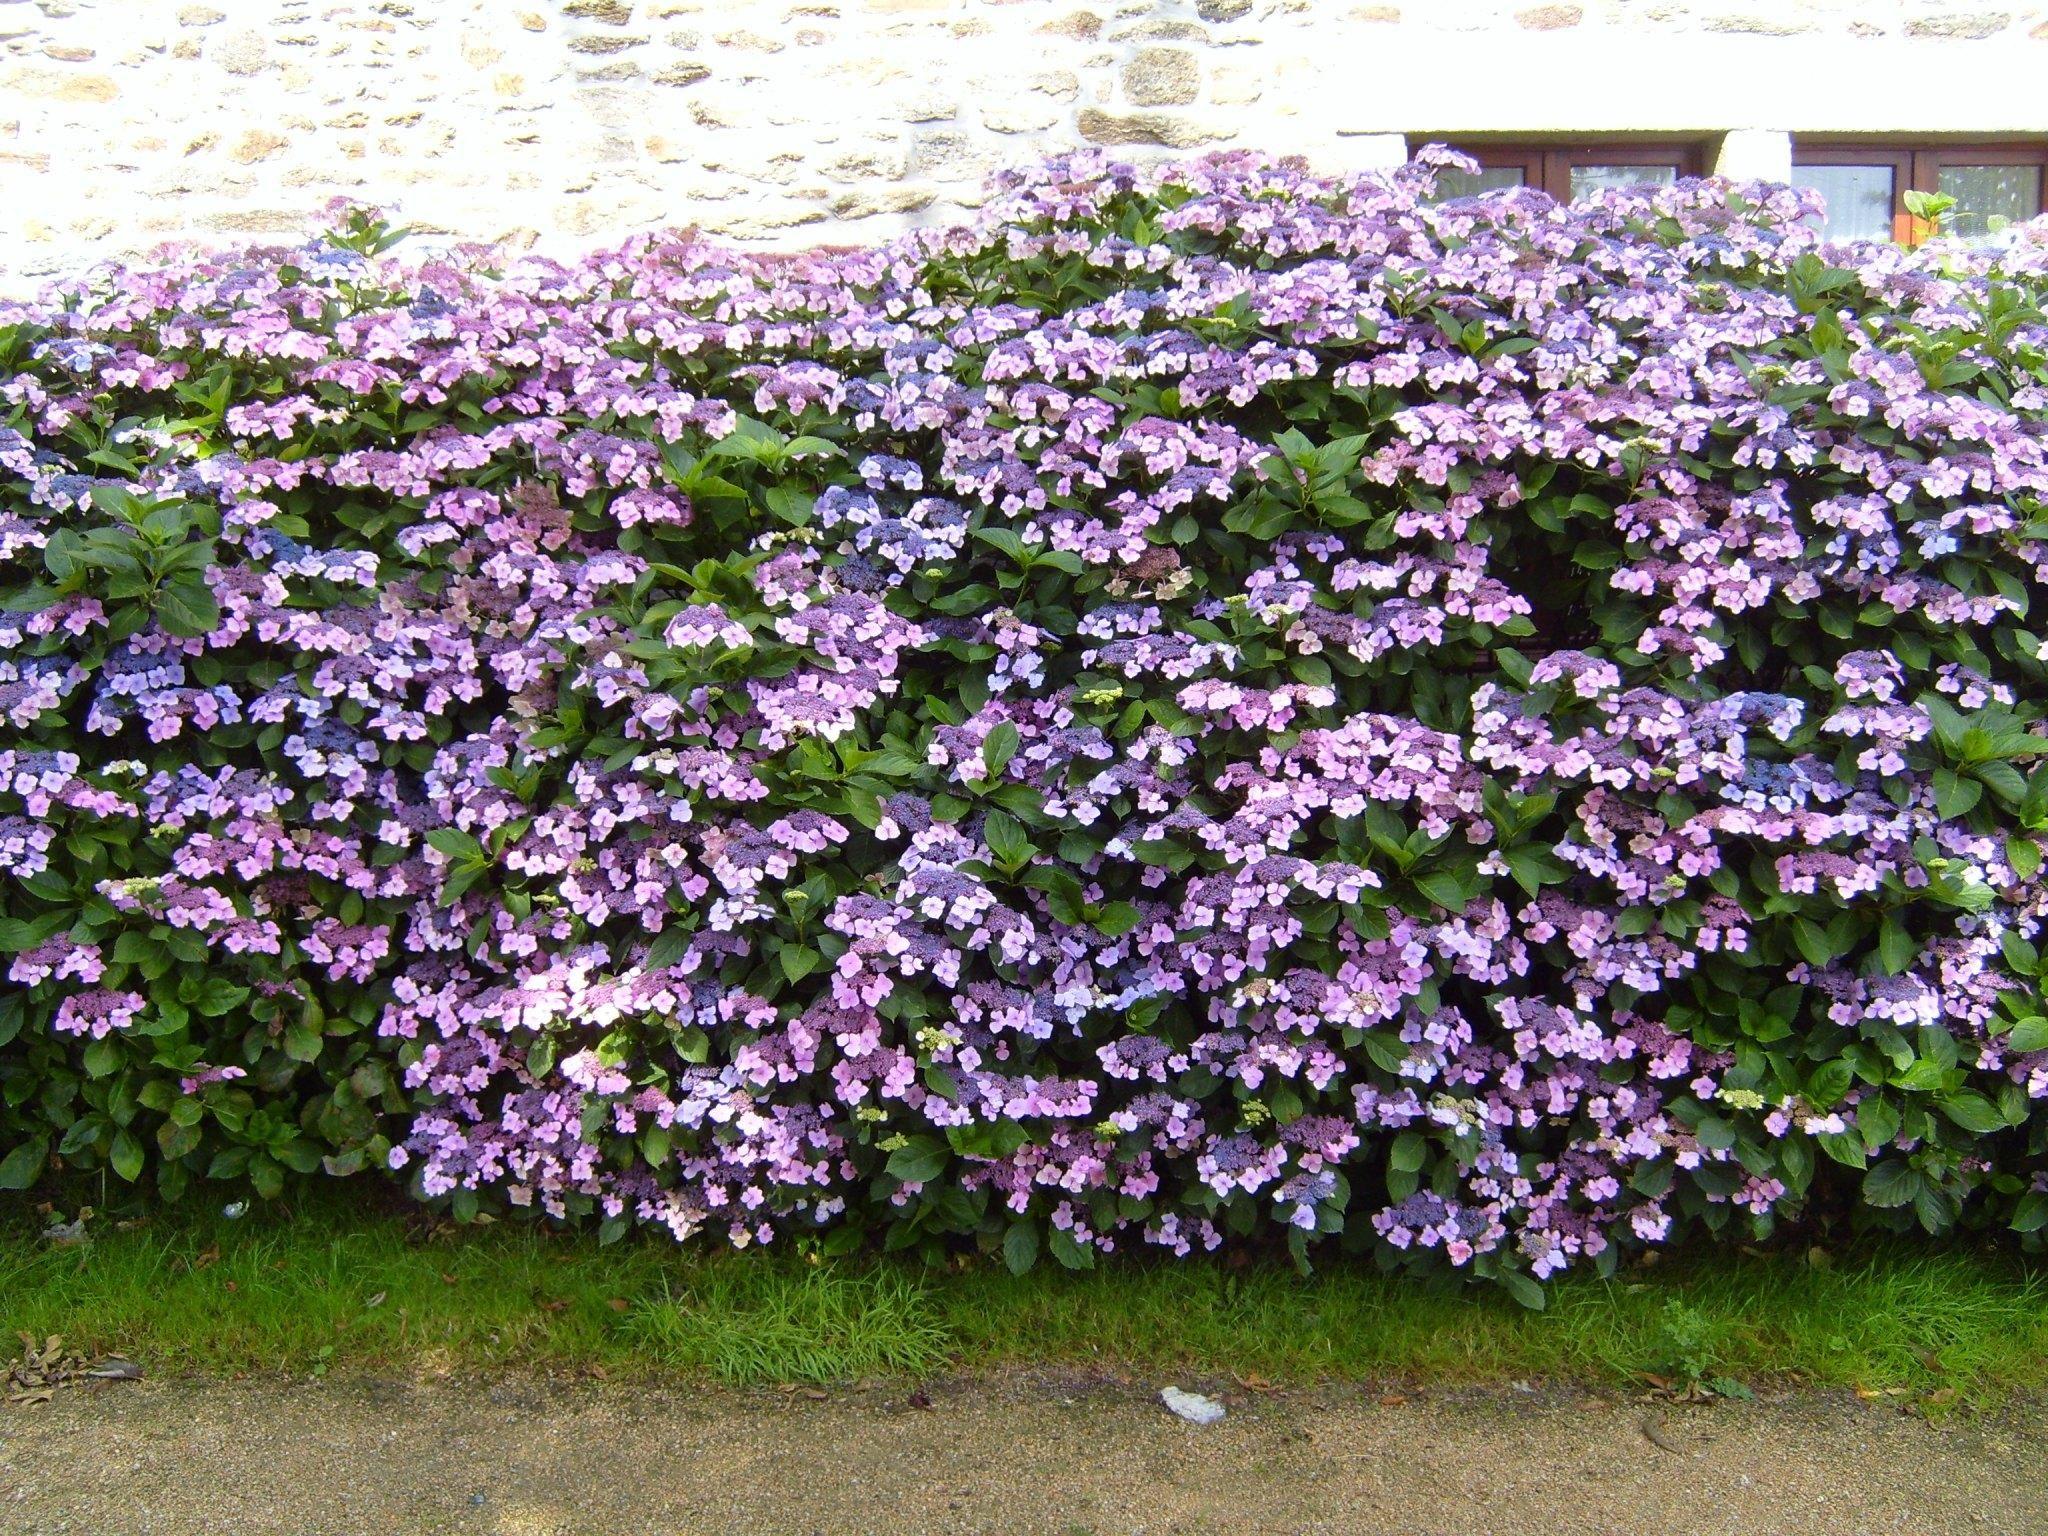 File:Flowered hedge flowers hydrangea.jpg - Wikimedia Commons